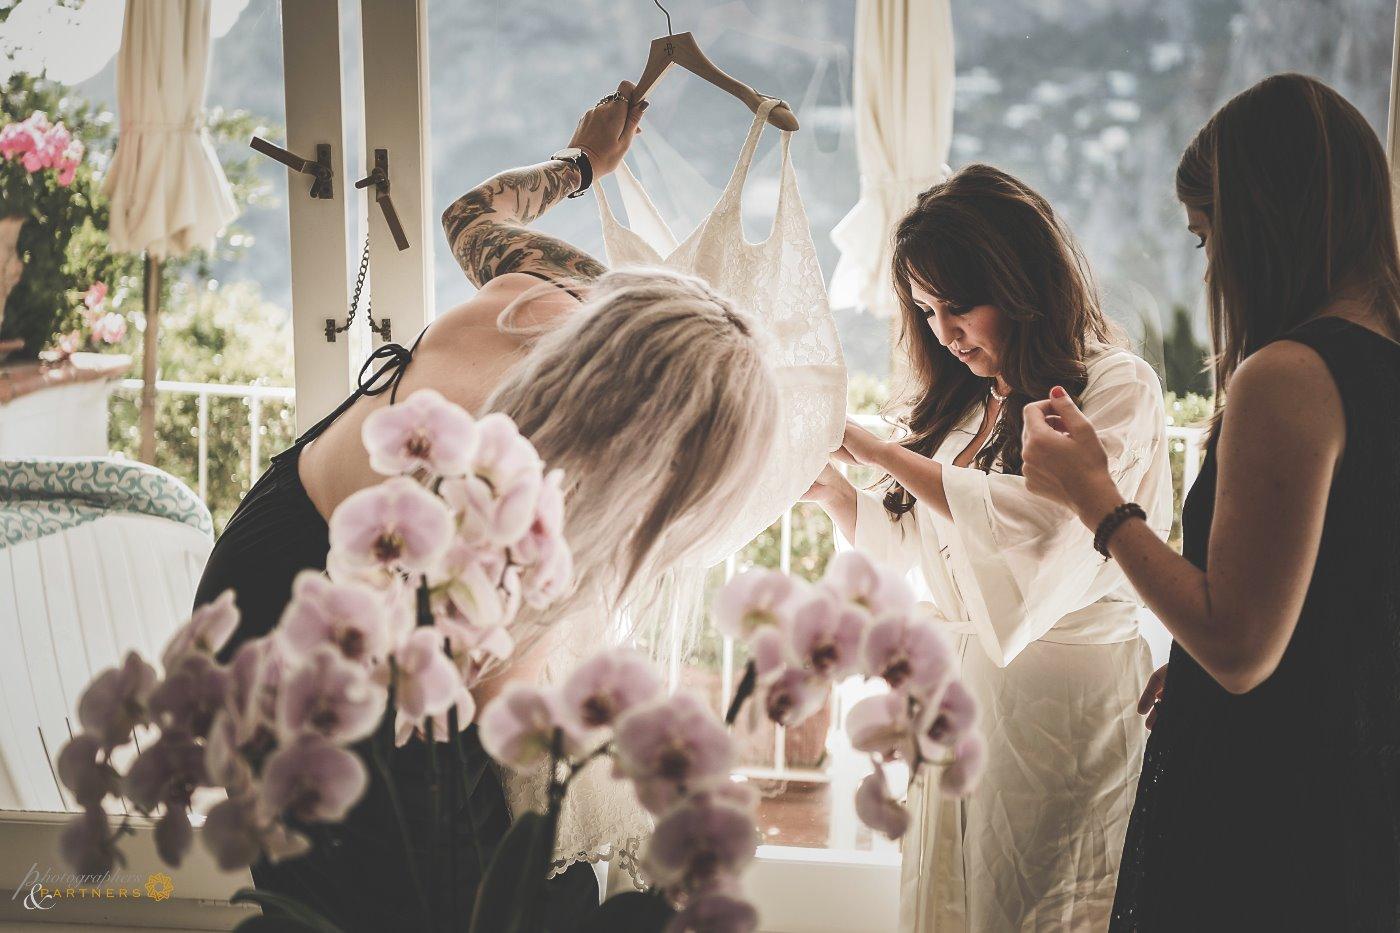 photographer_wedding_capri_04.jpg